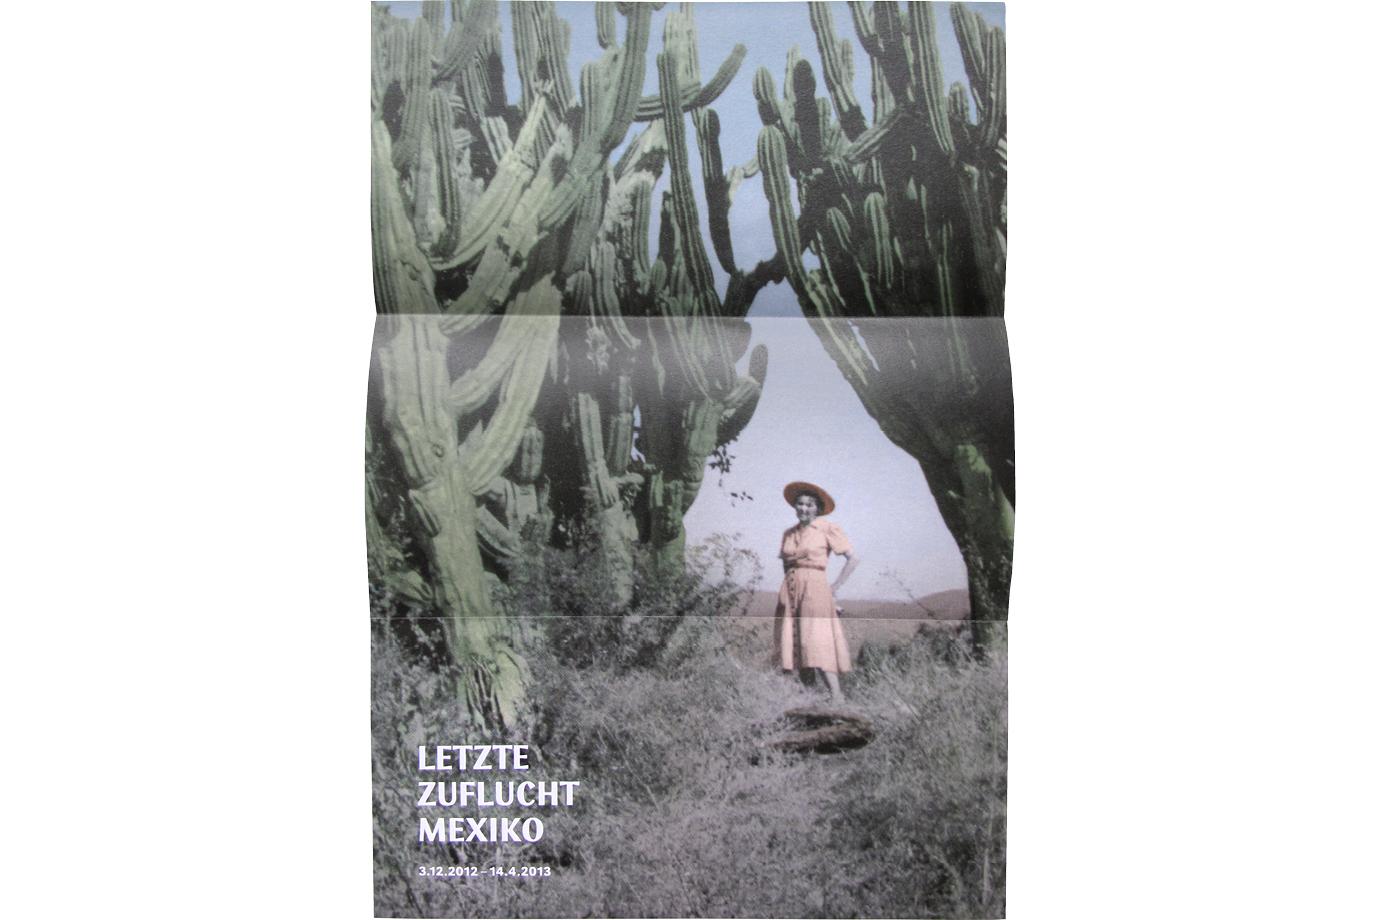 http://e-o-t.de/wordpress/wp-content/uploads/2017/01/2012_eot-Mexiko-identity-02.jpg